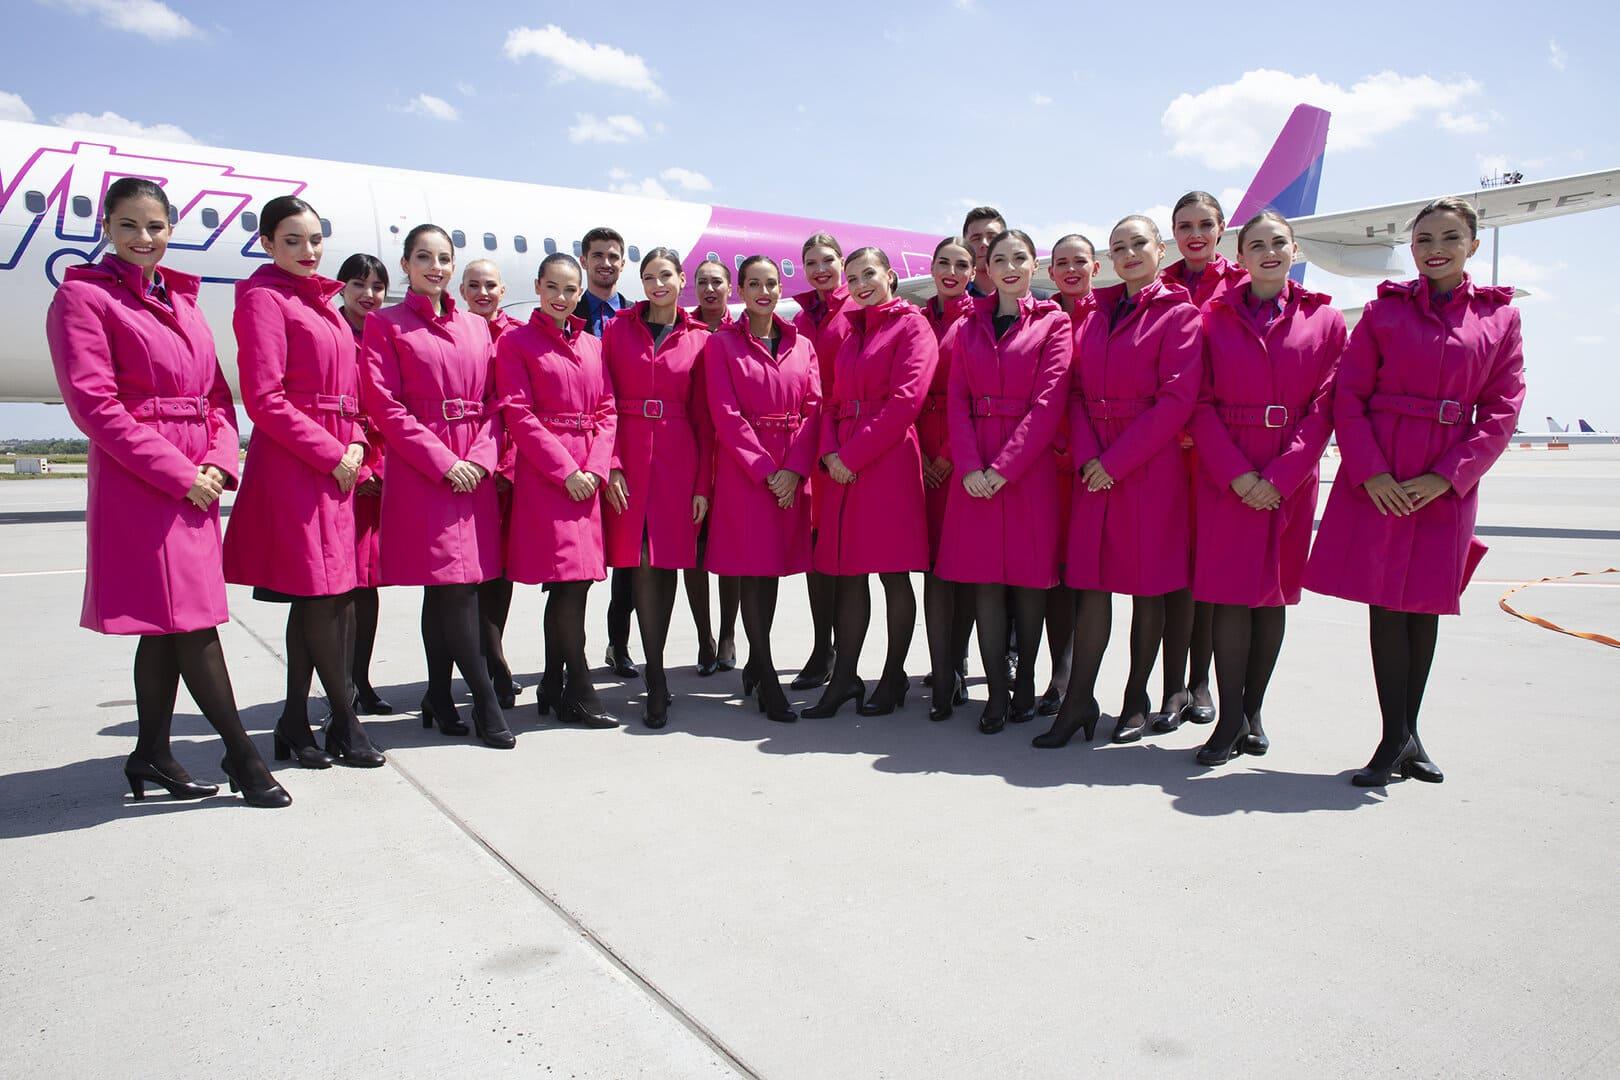 Wizz Air chatbot Amelia